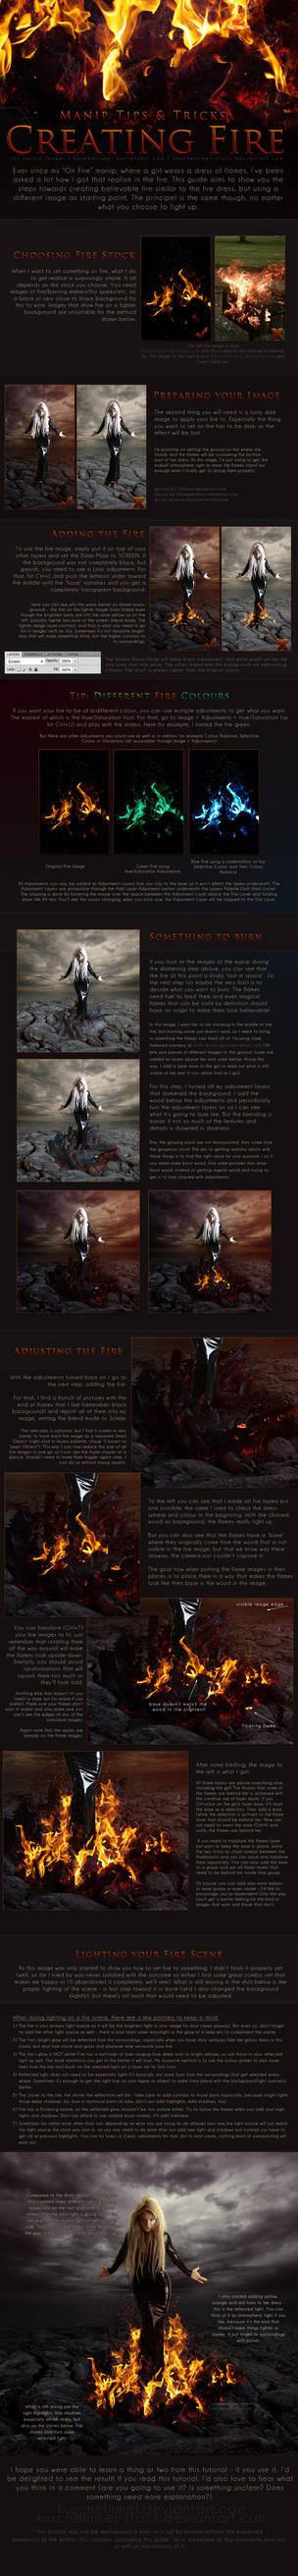 Manip T+T - Creating Fire by kuschelirmel-stock